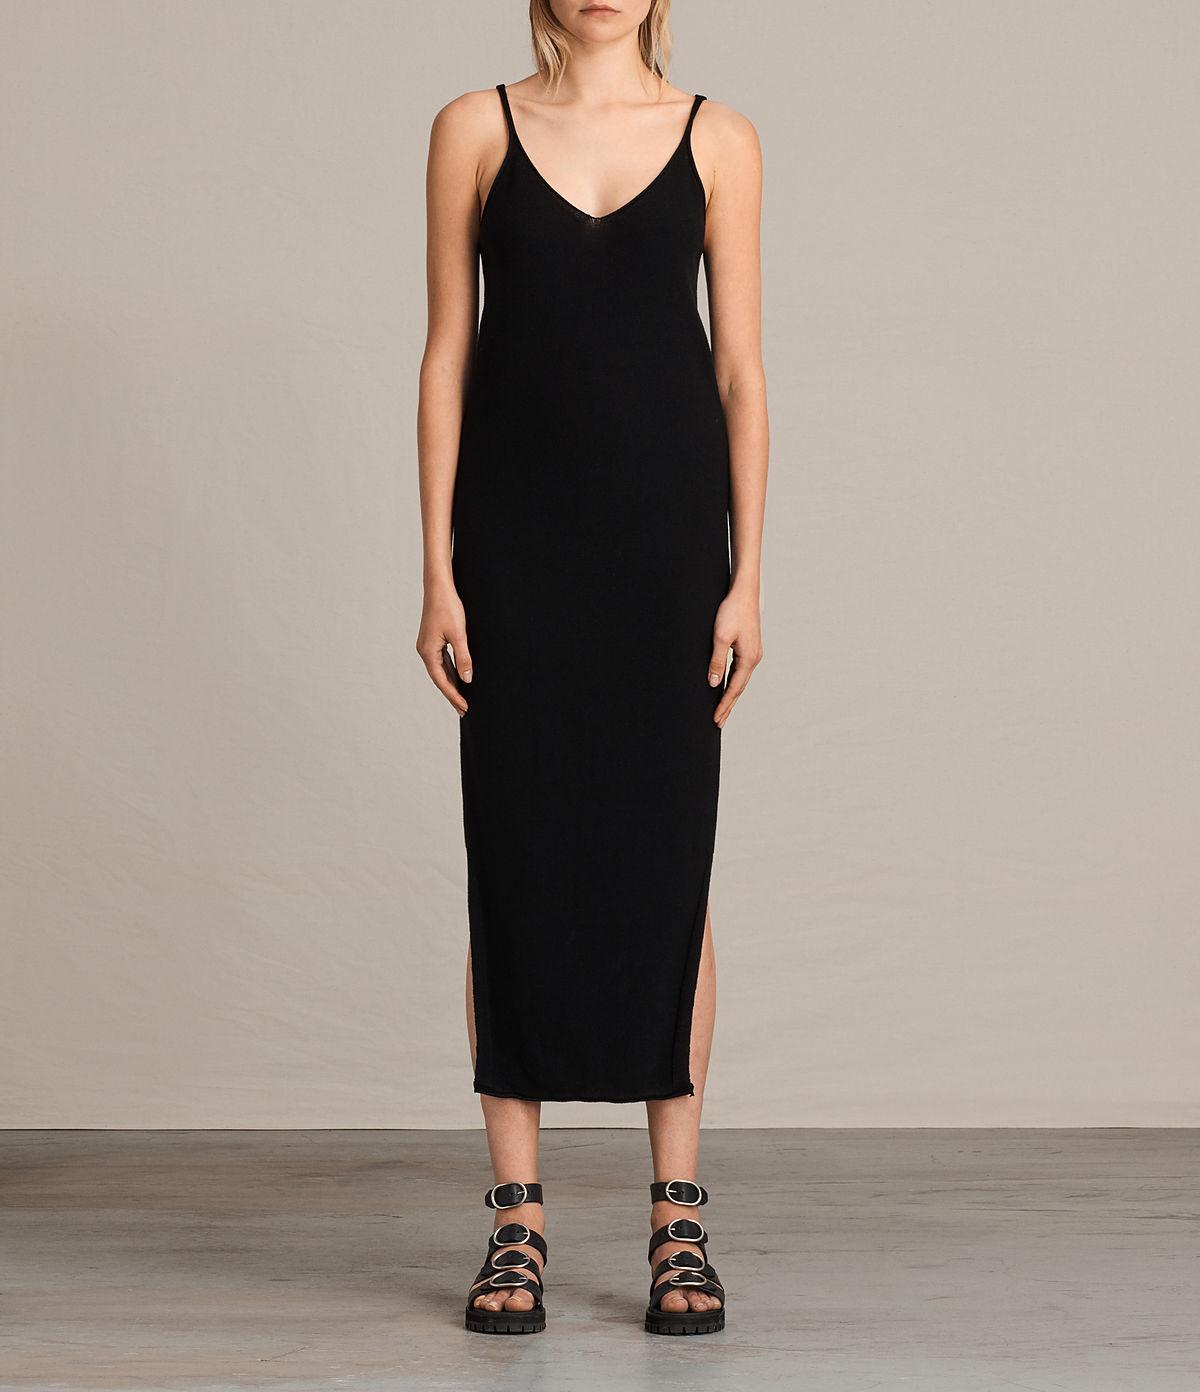 blyth-long-dress